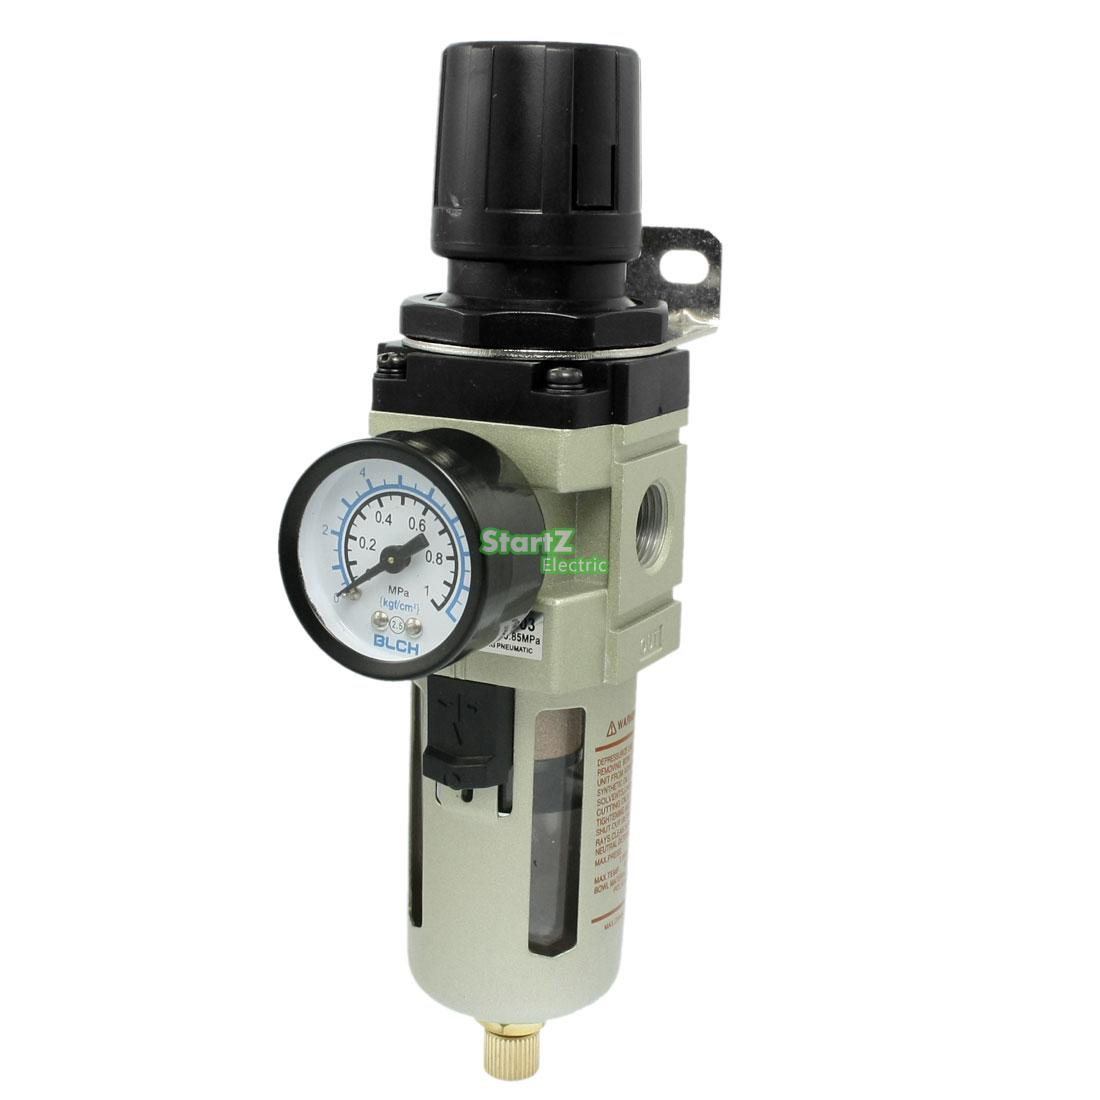 AW3000-03D  G3/8''  Automatic Drain Type  SMC Type Air Filter Regulator Air Treatment Units pneumatic air filter regulator aw3000 03d 3 8 smc type air treatment unit automatic drain type